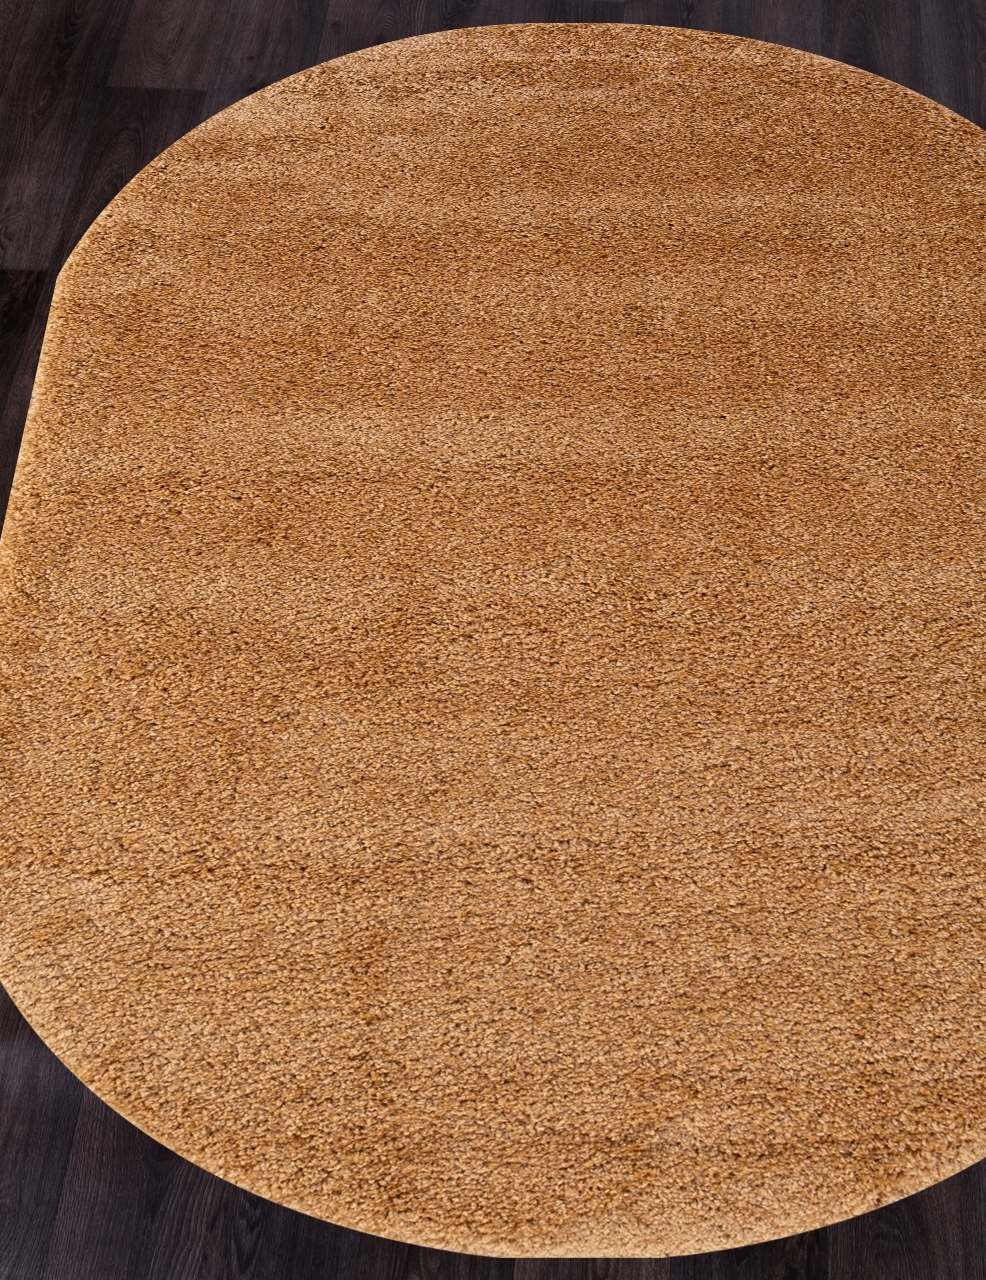 Ковер s600 - DARK BEIGE - Овал - коллекция SHAGGY ULTRA - фото 1